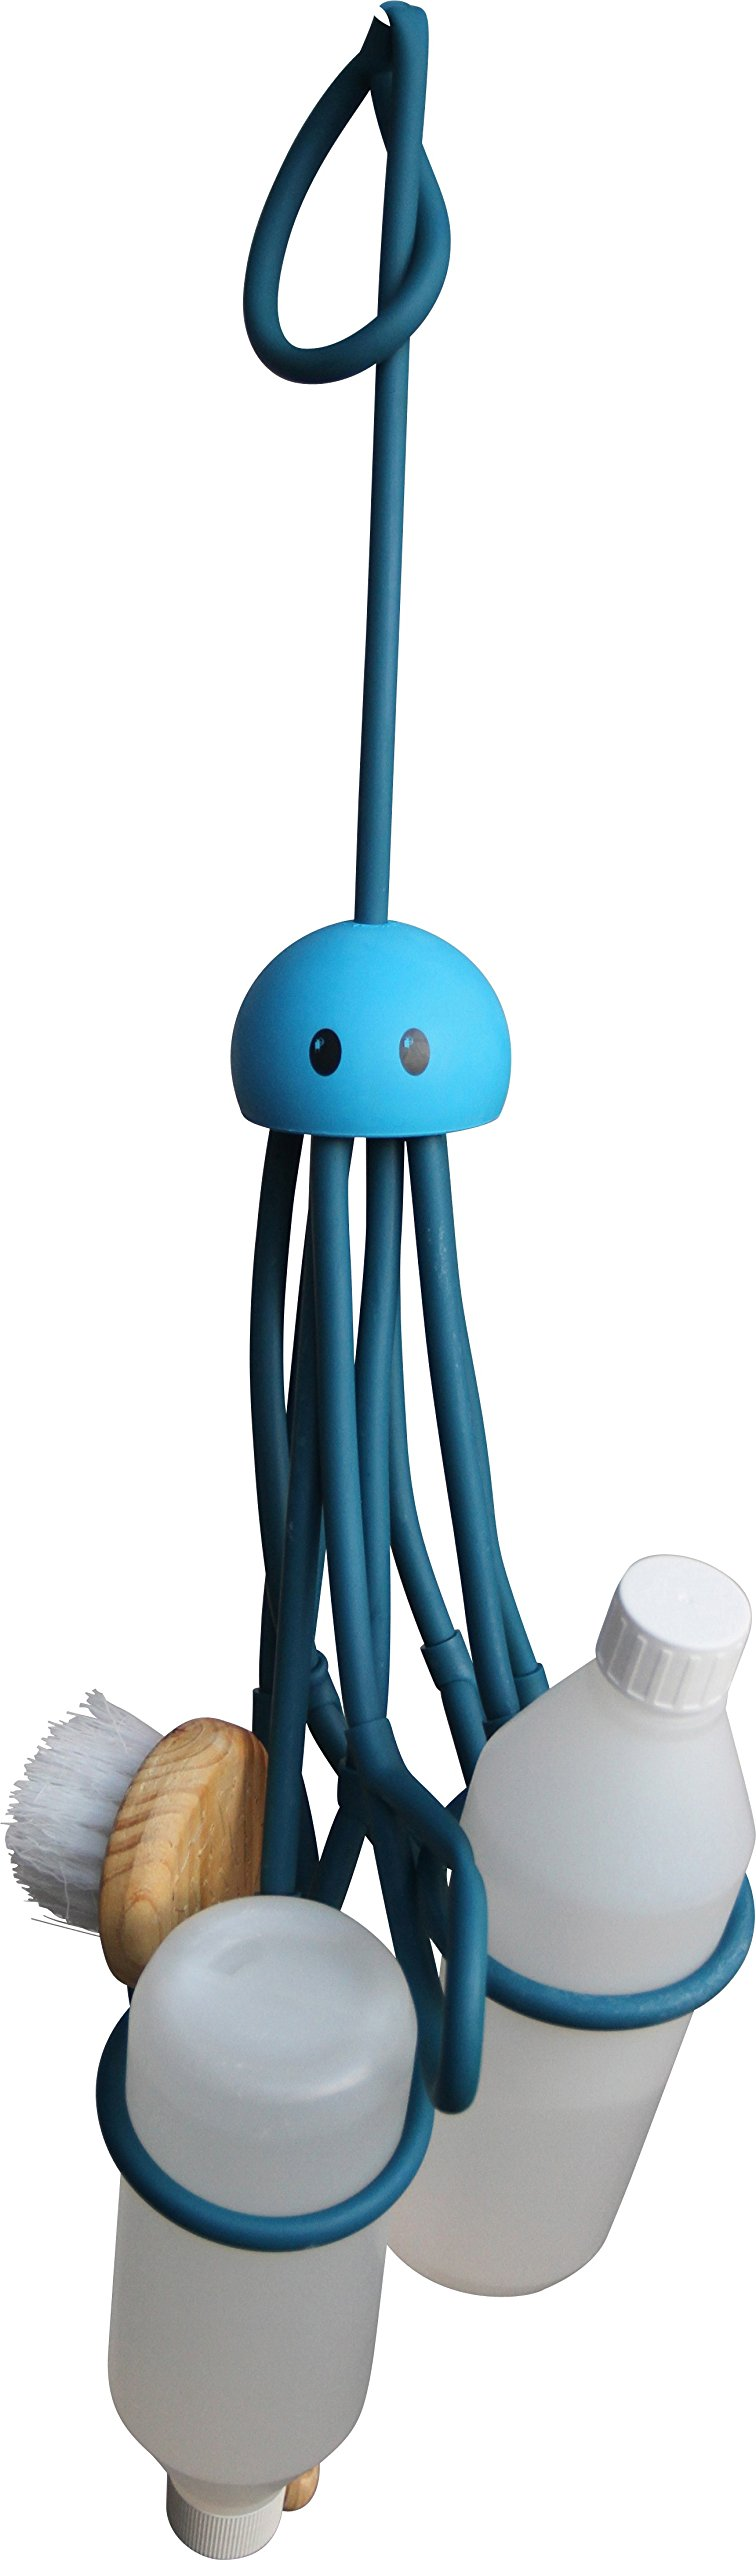 Formverkert Octopus Shower Caddy (in Blue) - Shower Gel Shampoo Conditioner Brush Razors Toys Accessories Holder, 9 Slots, Fits All Sized Bottles, Stylish Fun Bath Shower Organizer, Designed in Sweden